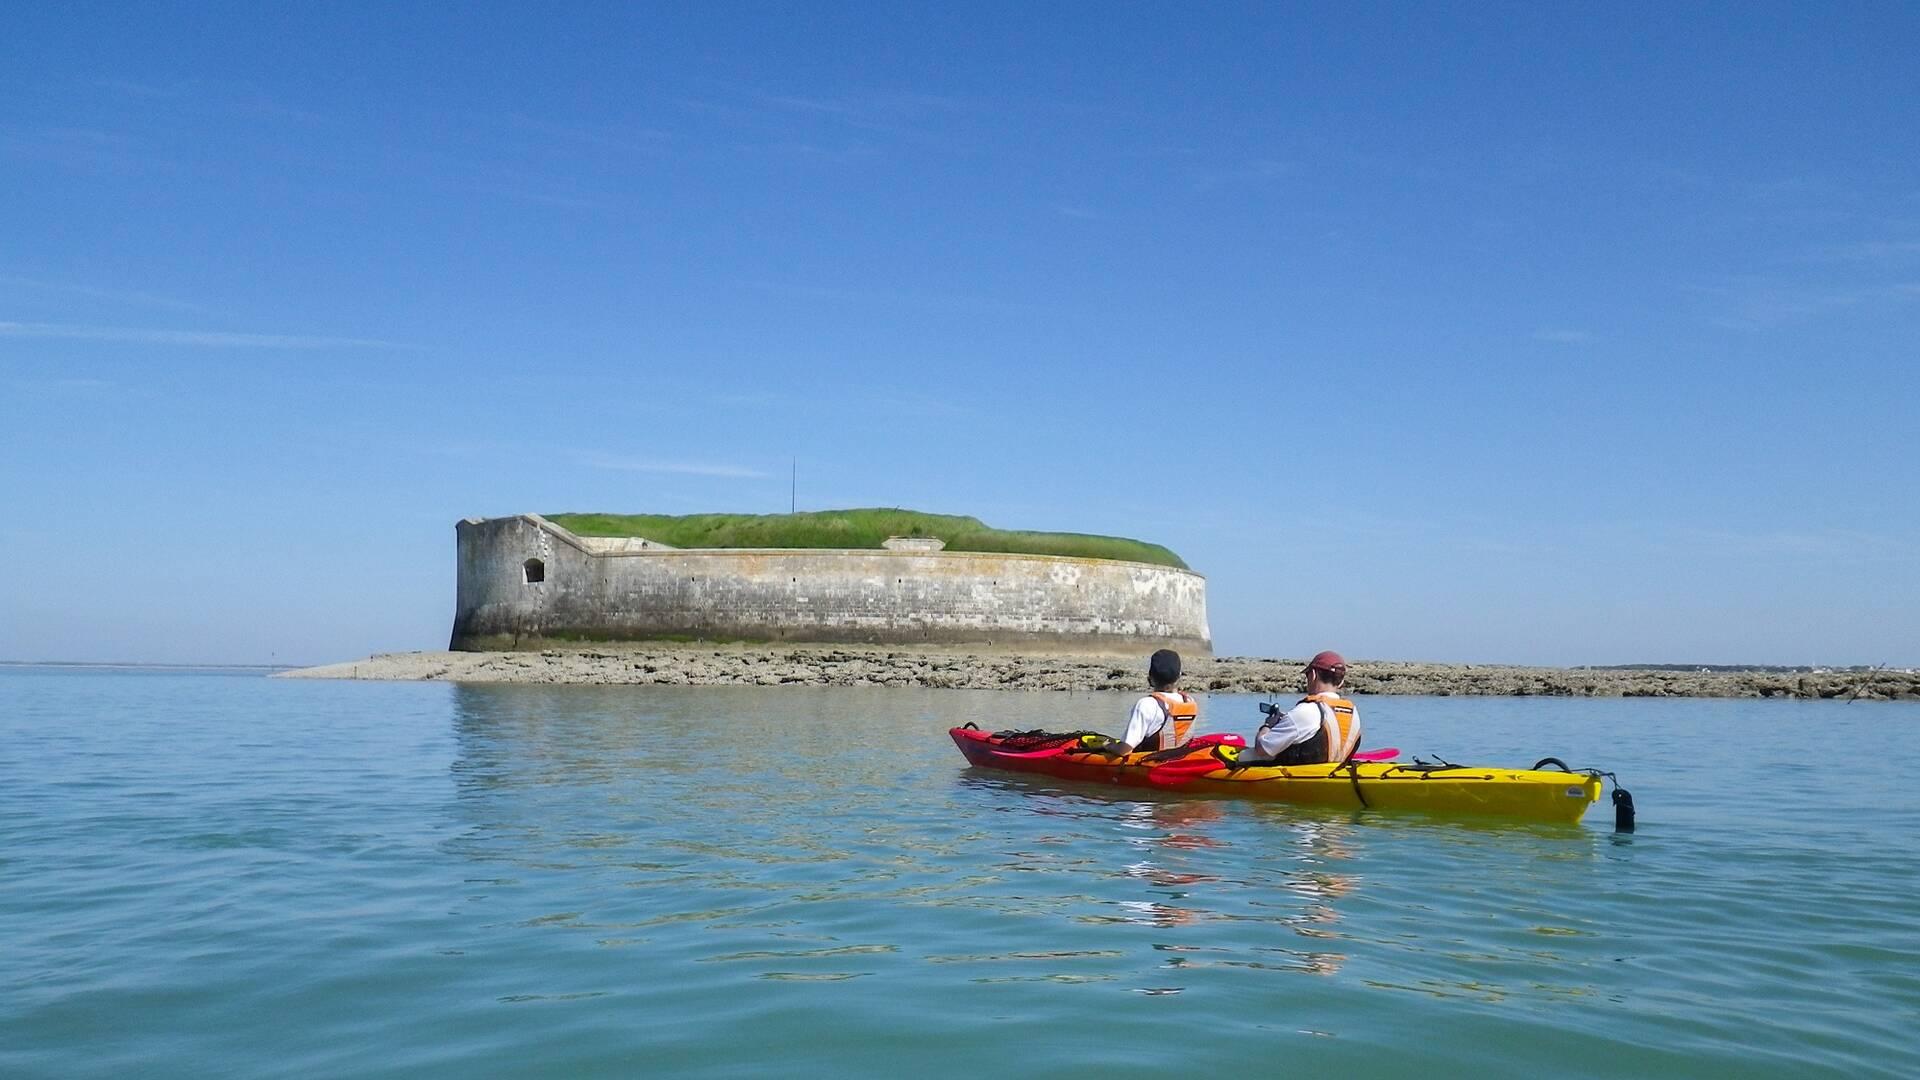 En kayak devant le Fort Enet